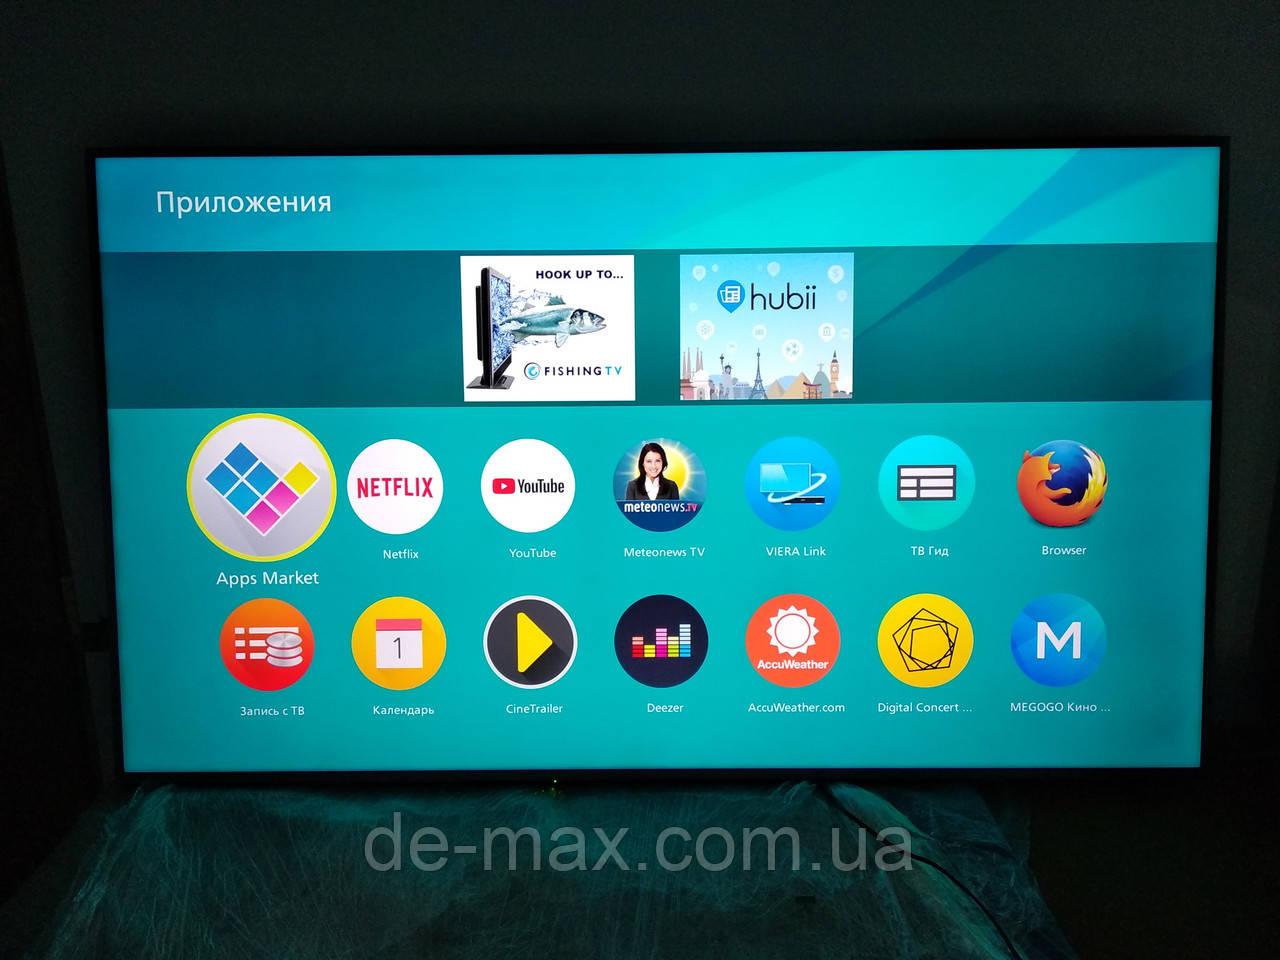 Телевизор 65 дюймов Панасоник Panasonic TX-65CXW704 4K UHD Smart TV Т2 Wi-Fi 3D